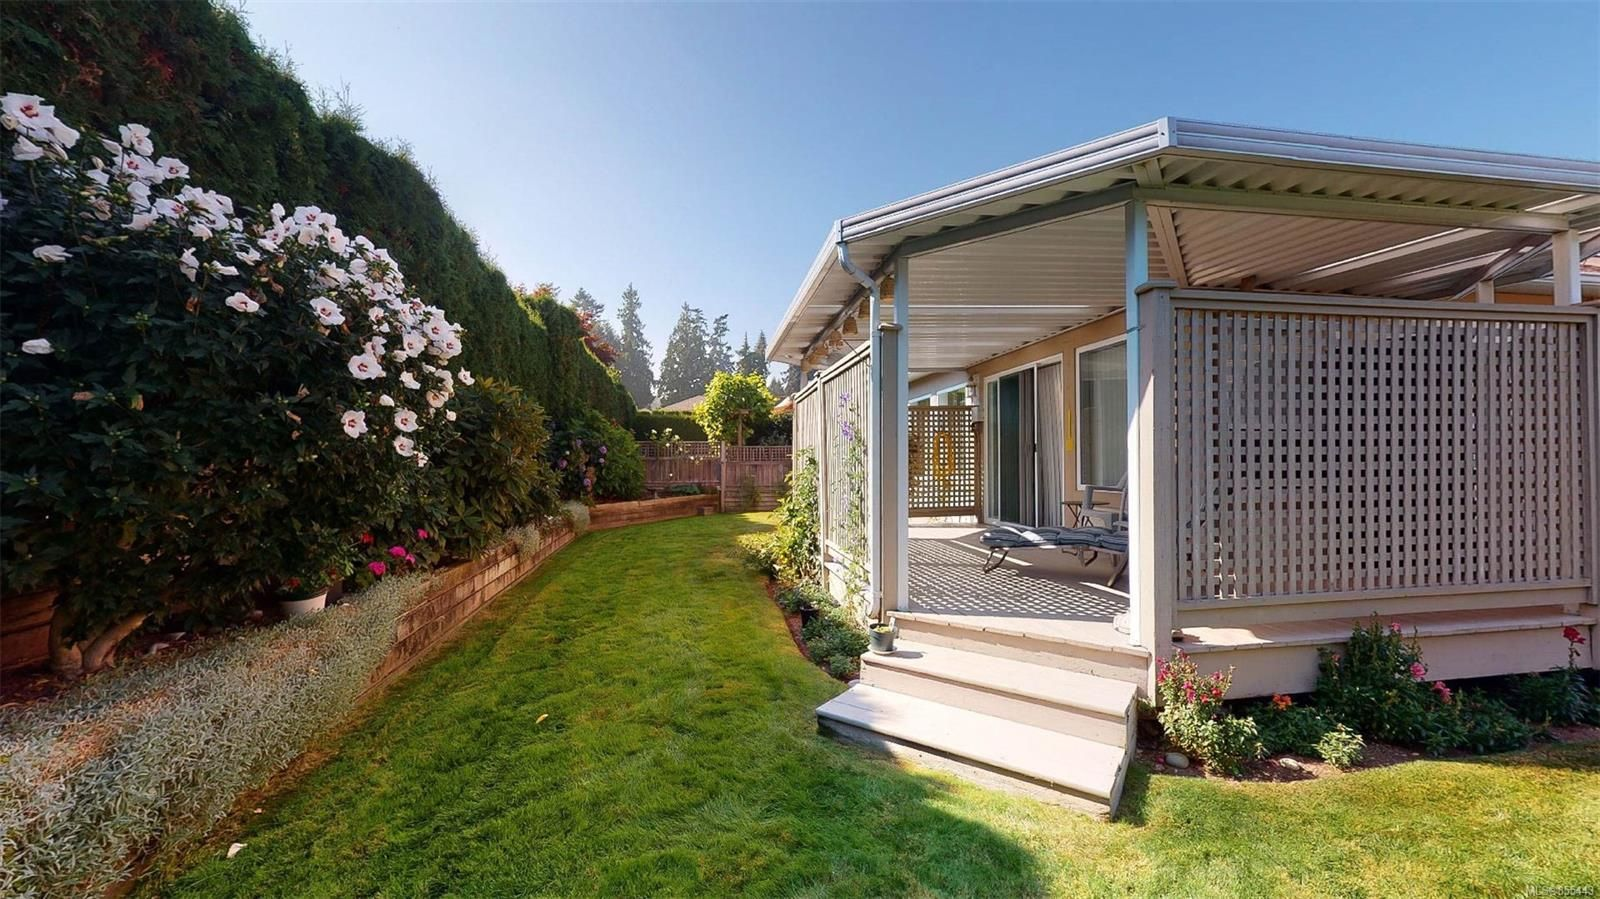 Photo 25: Photos: 1294 Leeward Way in : PQ Qualicum Beach House for sale (Parksville/Qualicum)  : MLS®# 855443